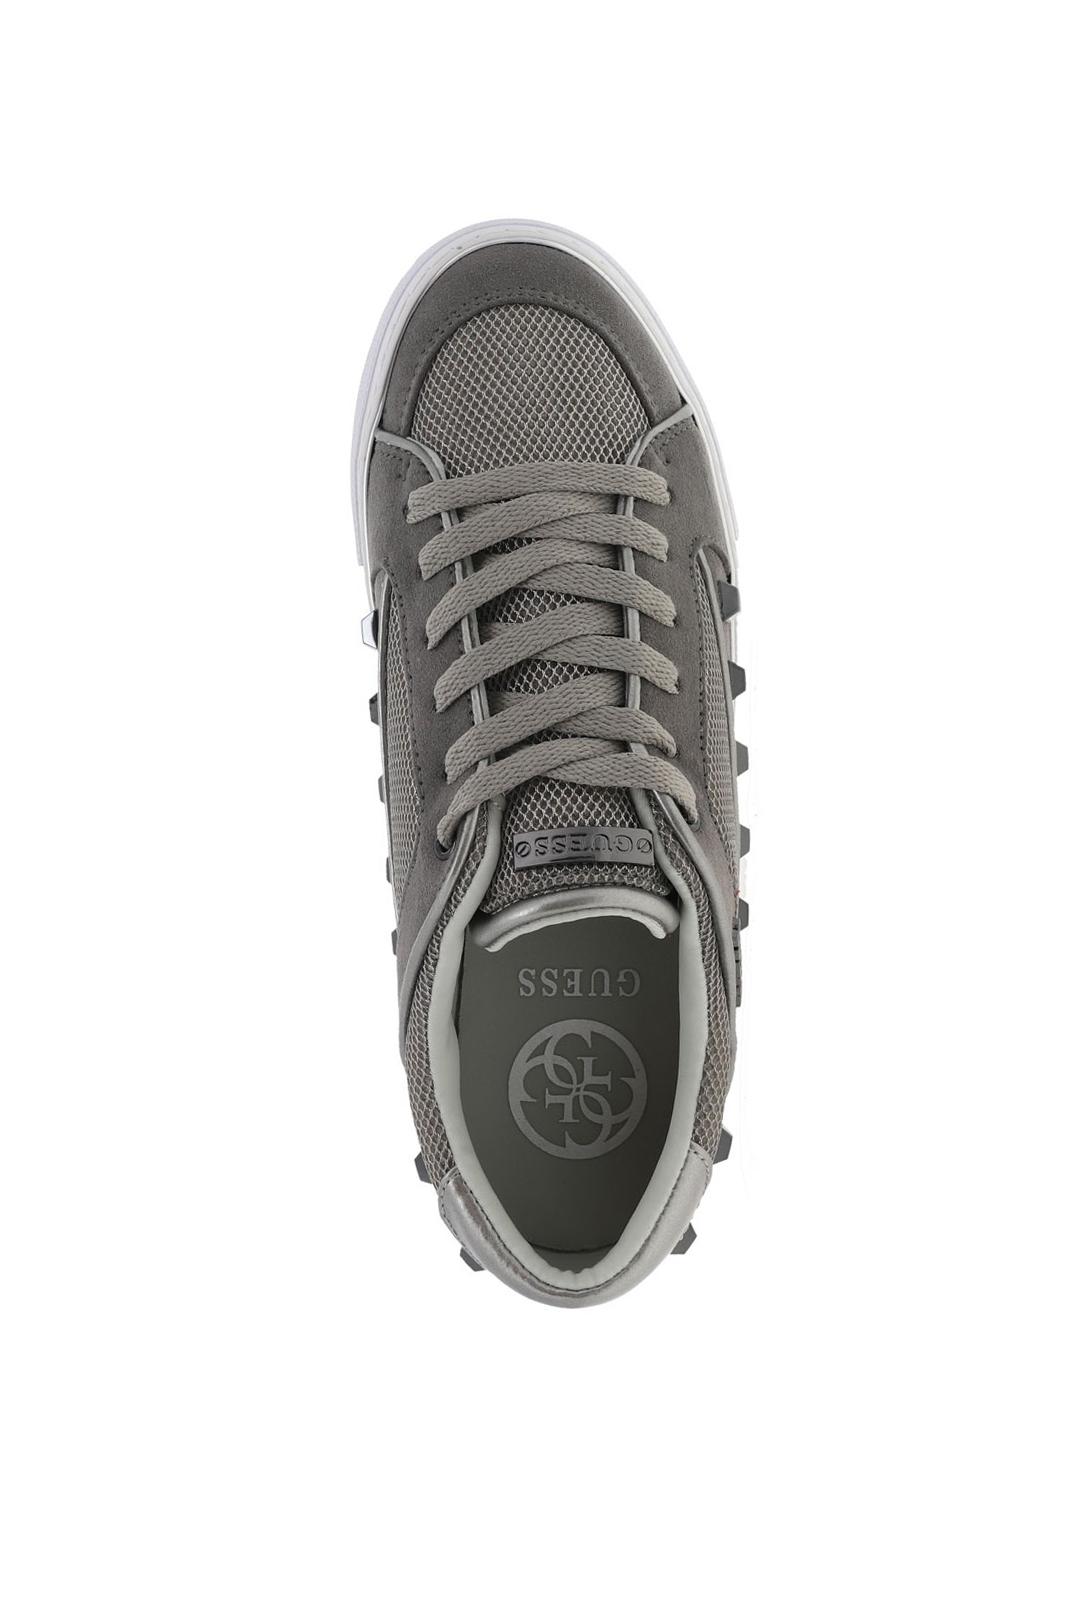 Baskets / Sneakers  Guess jeans FL5GL2 FAB12 SILVER